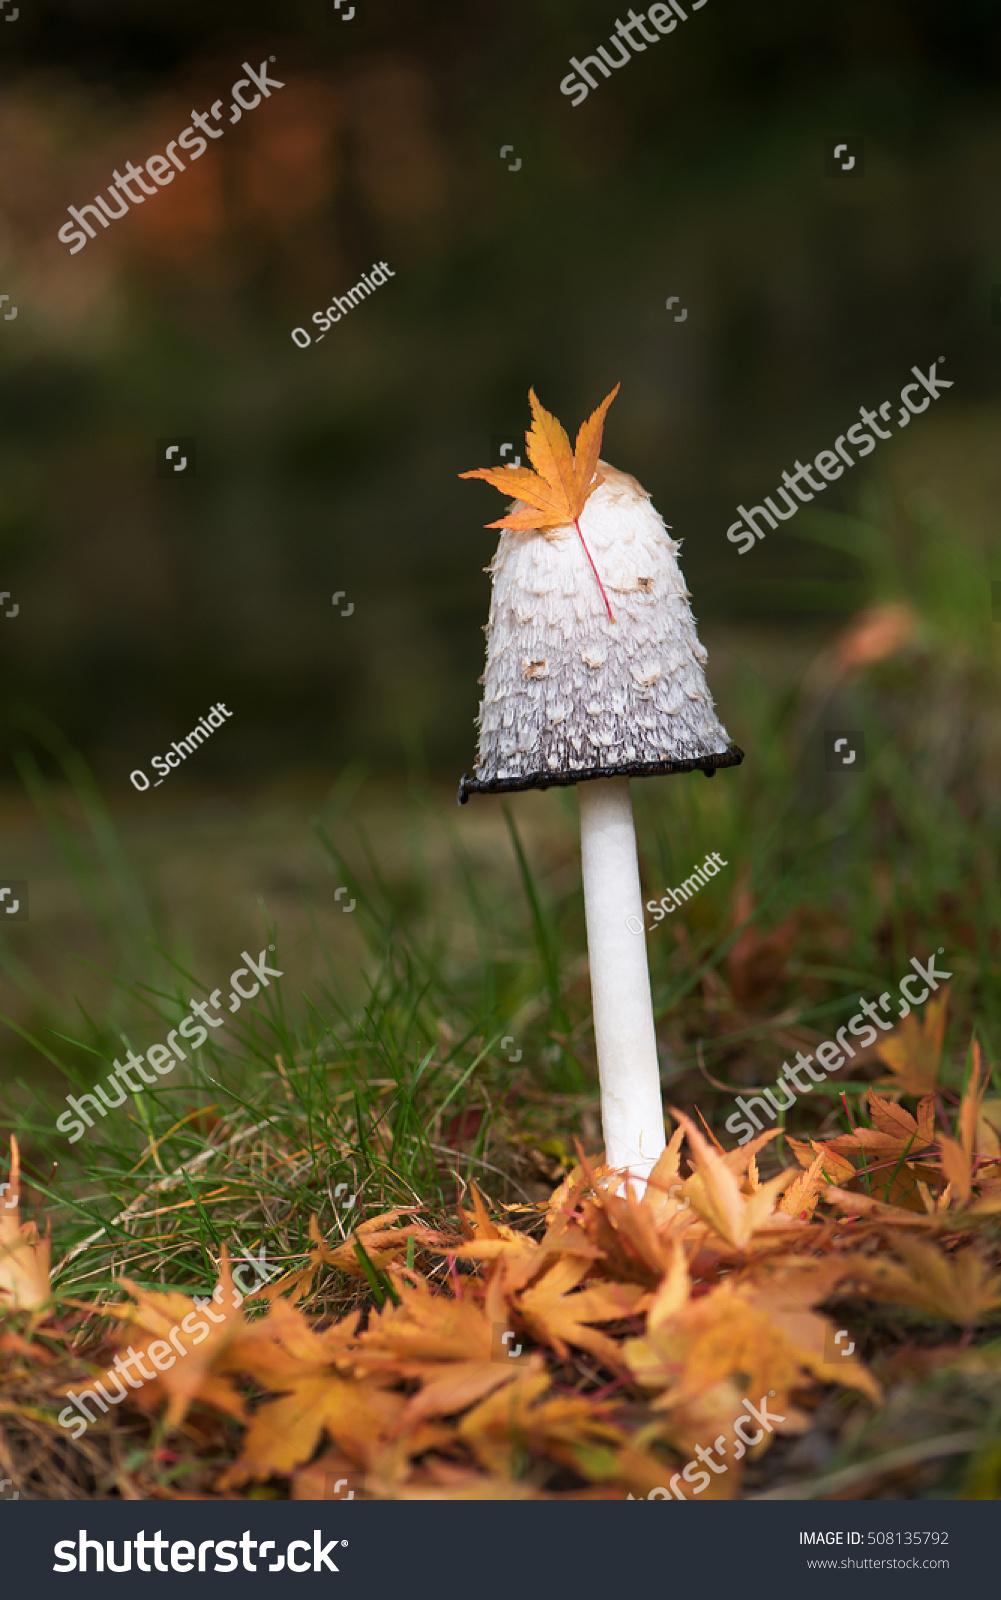 Shaggy Ink Cap Mushroom Growing On Stock Photo (Royalty Free ...